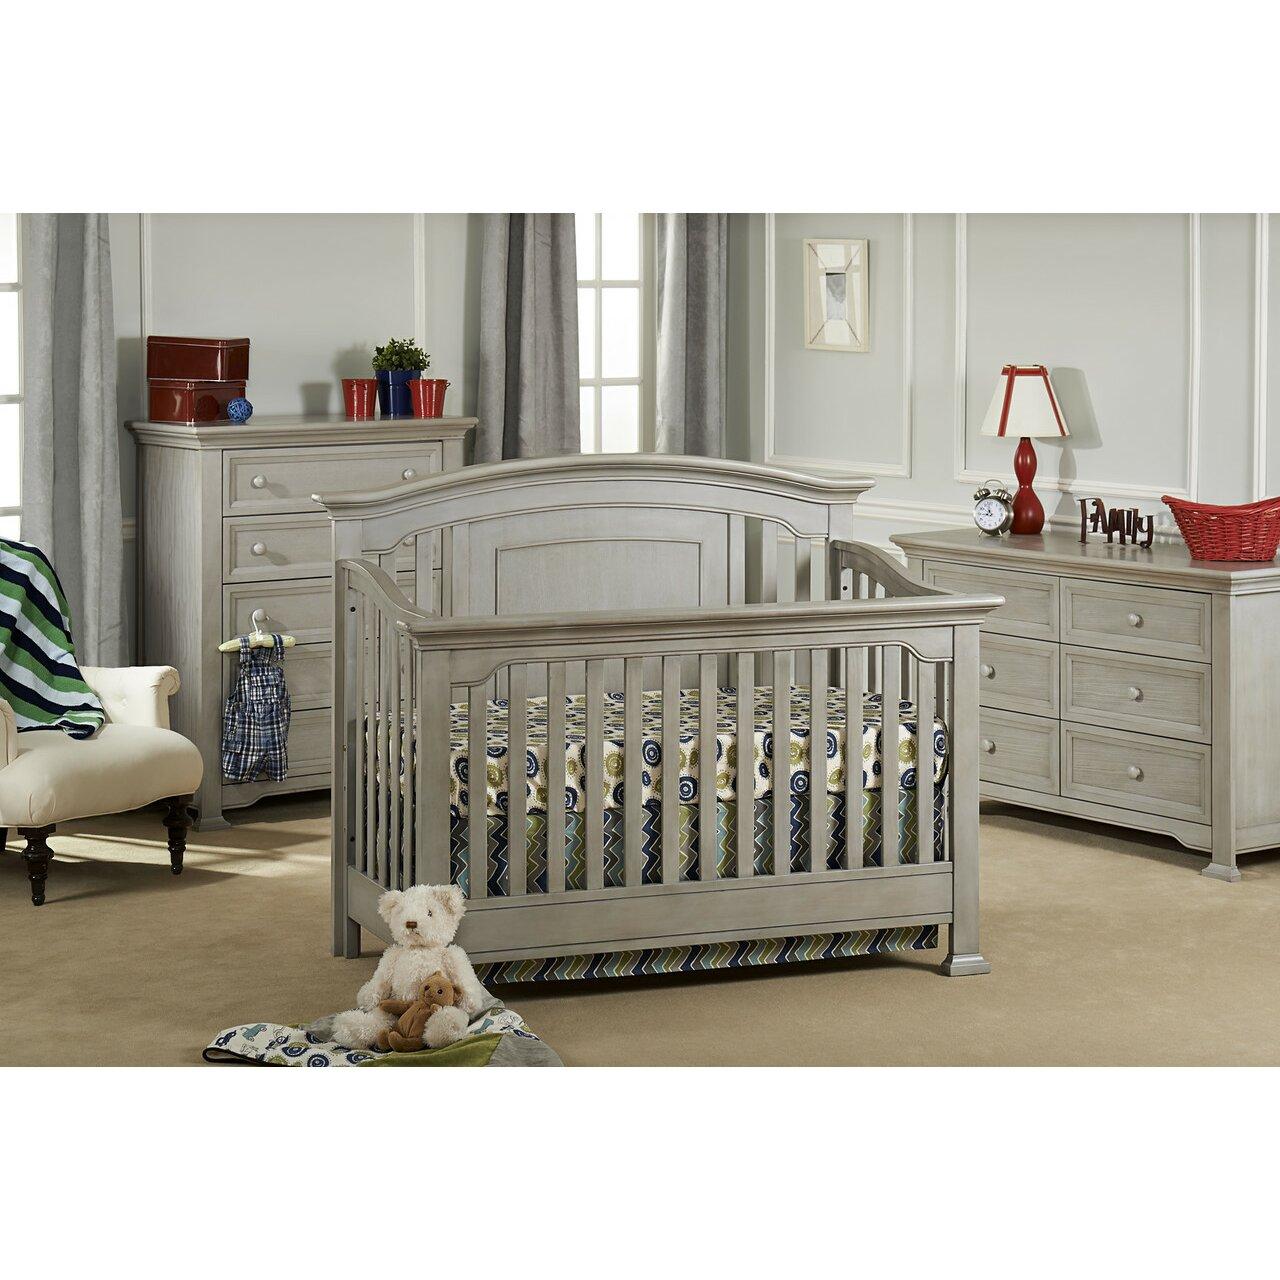 Baby bed furniture - Munir Eacute Medford Lifetime 4 In 1 Convertible Crib